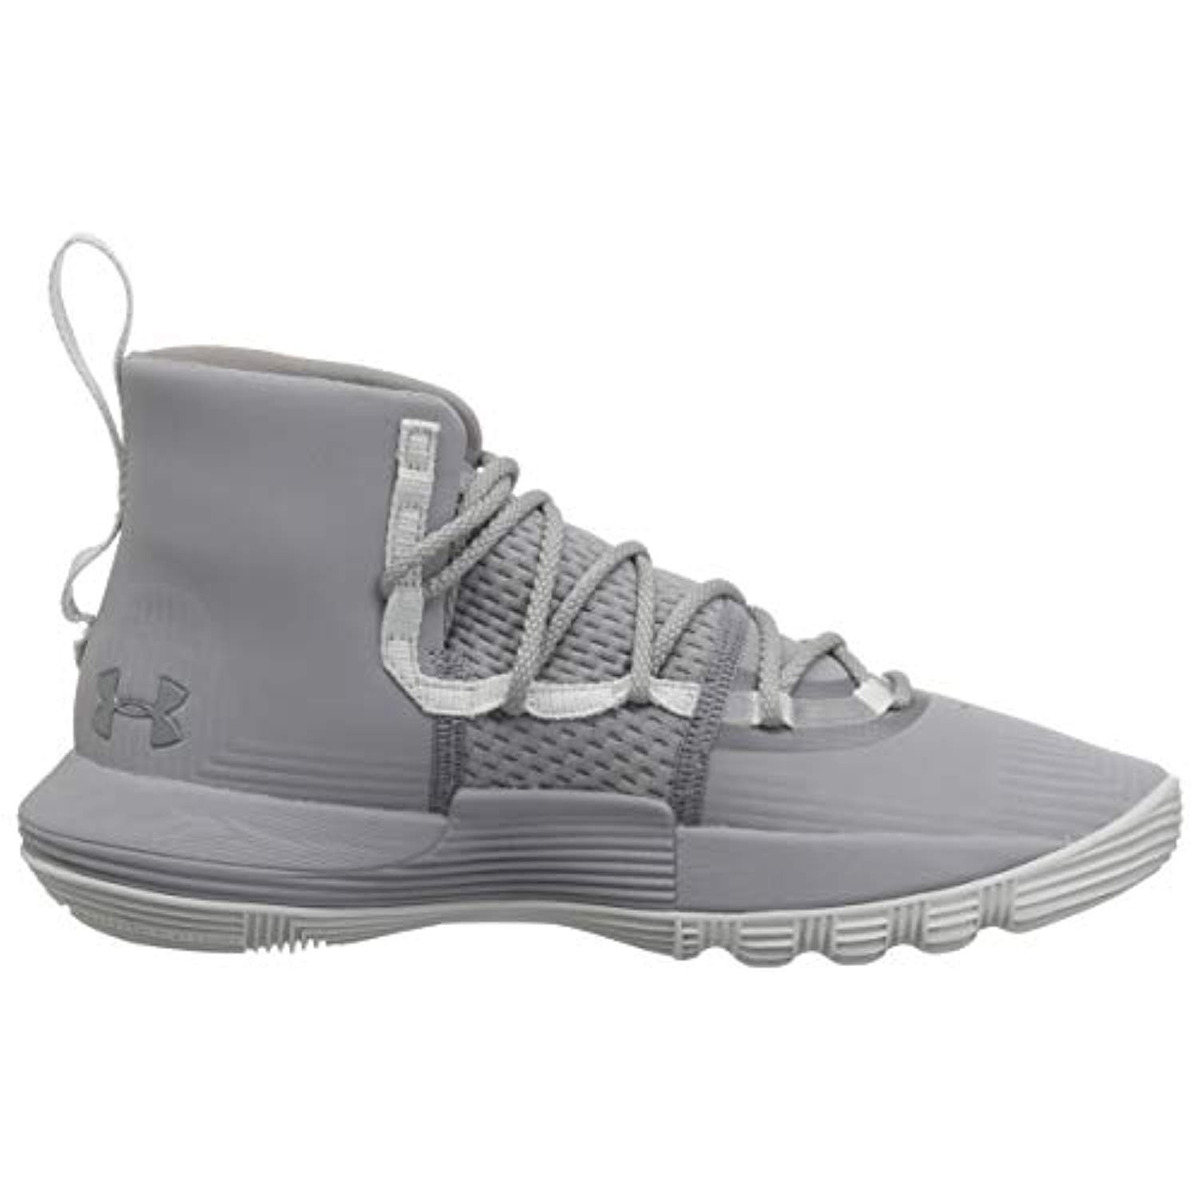 low priced 65b8a 4d622 Under Armour Kids Grade School Sc 3zer0 Ii Basketball Shoe